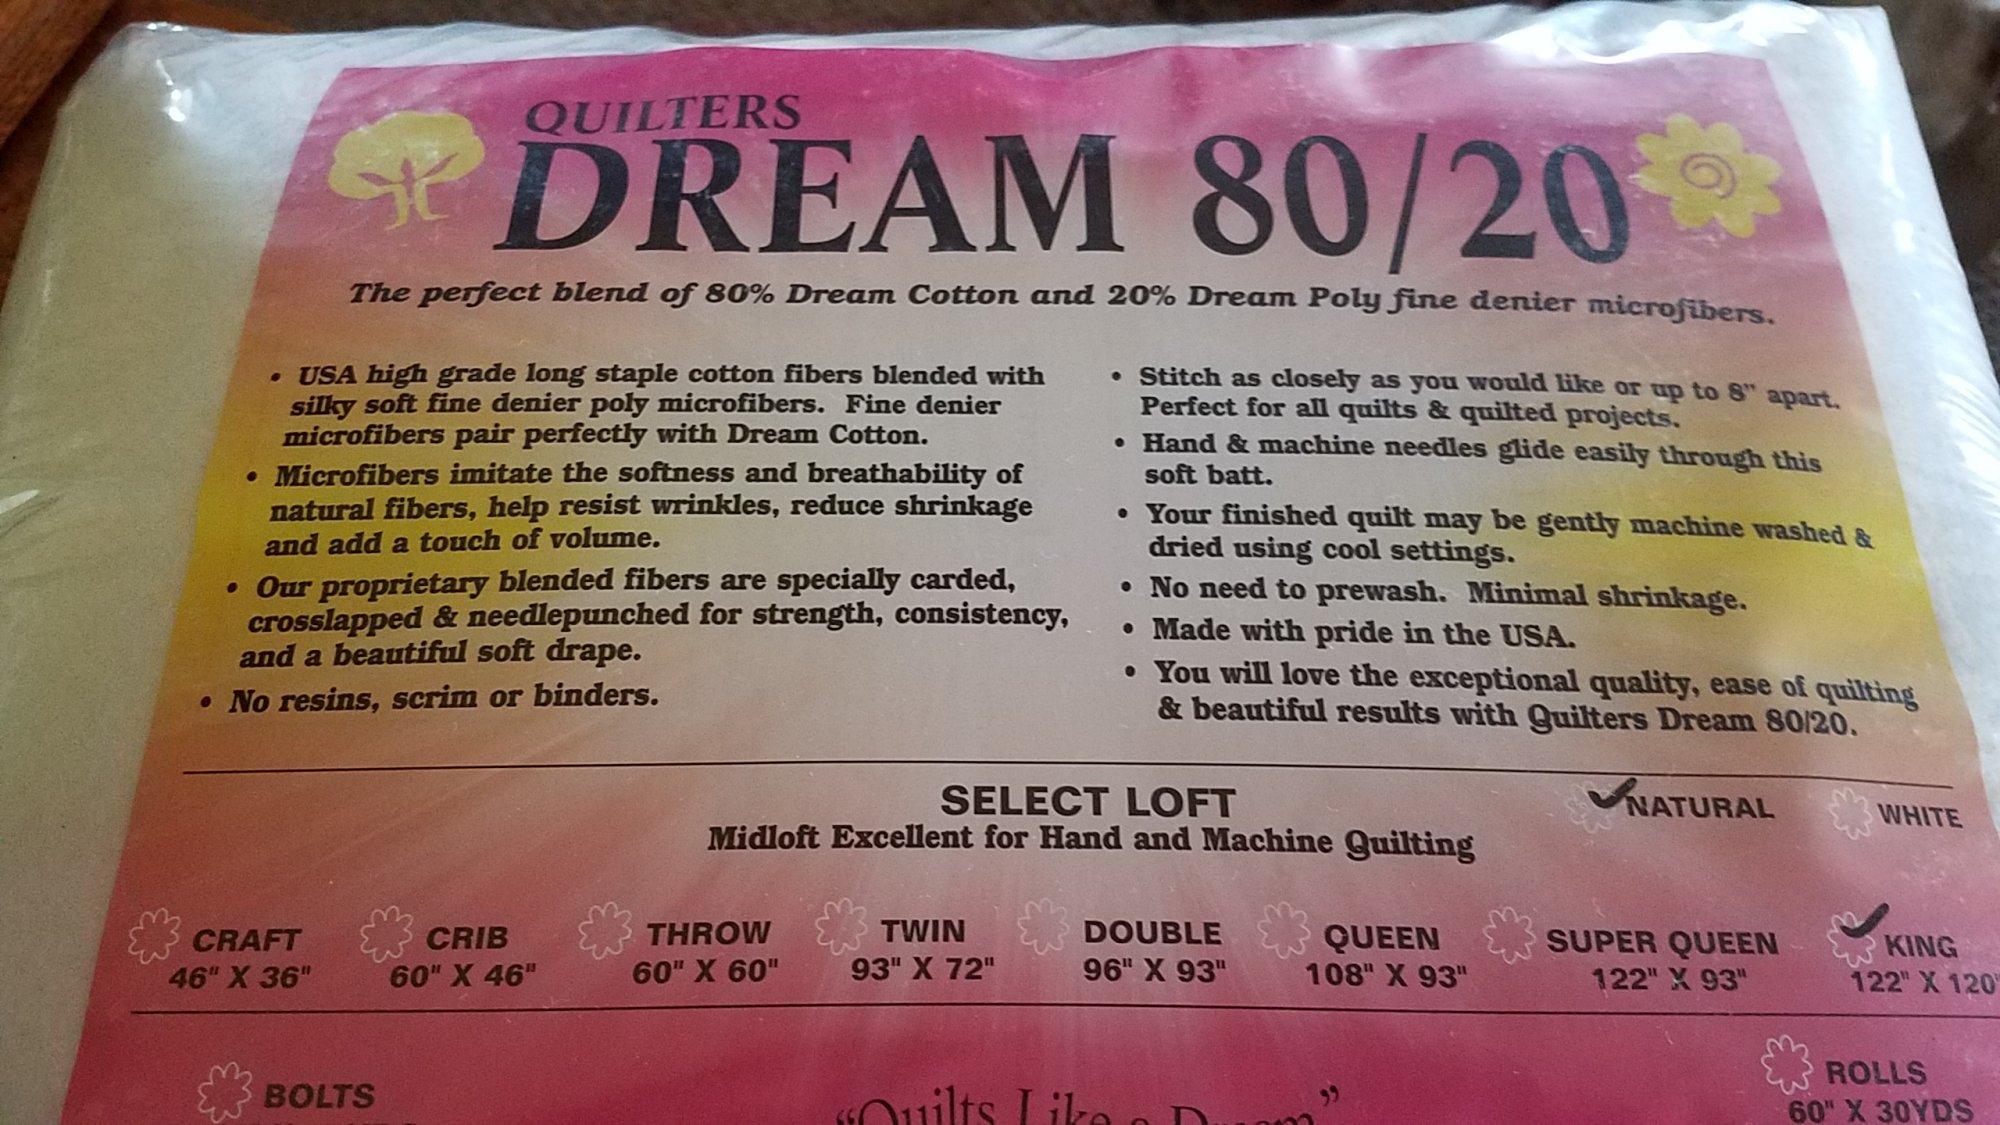 Dream 80/20 King